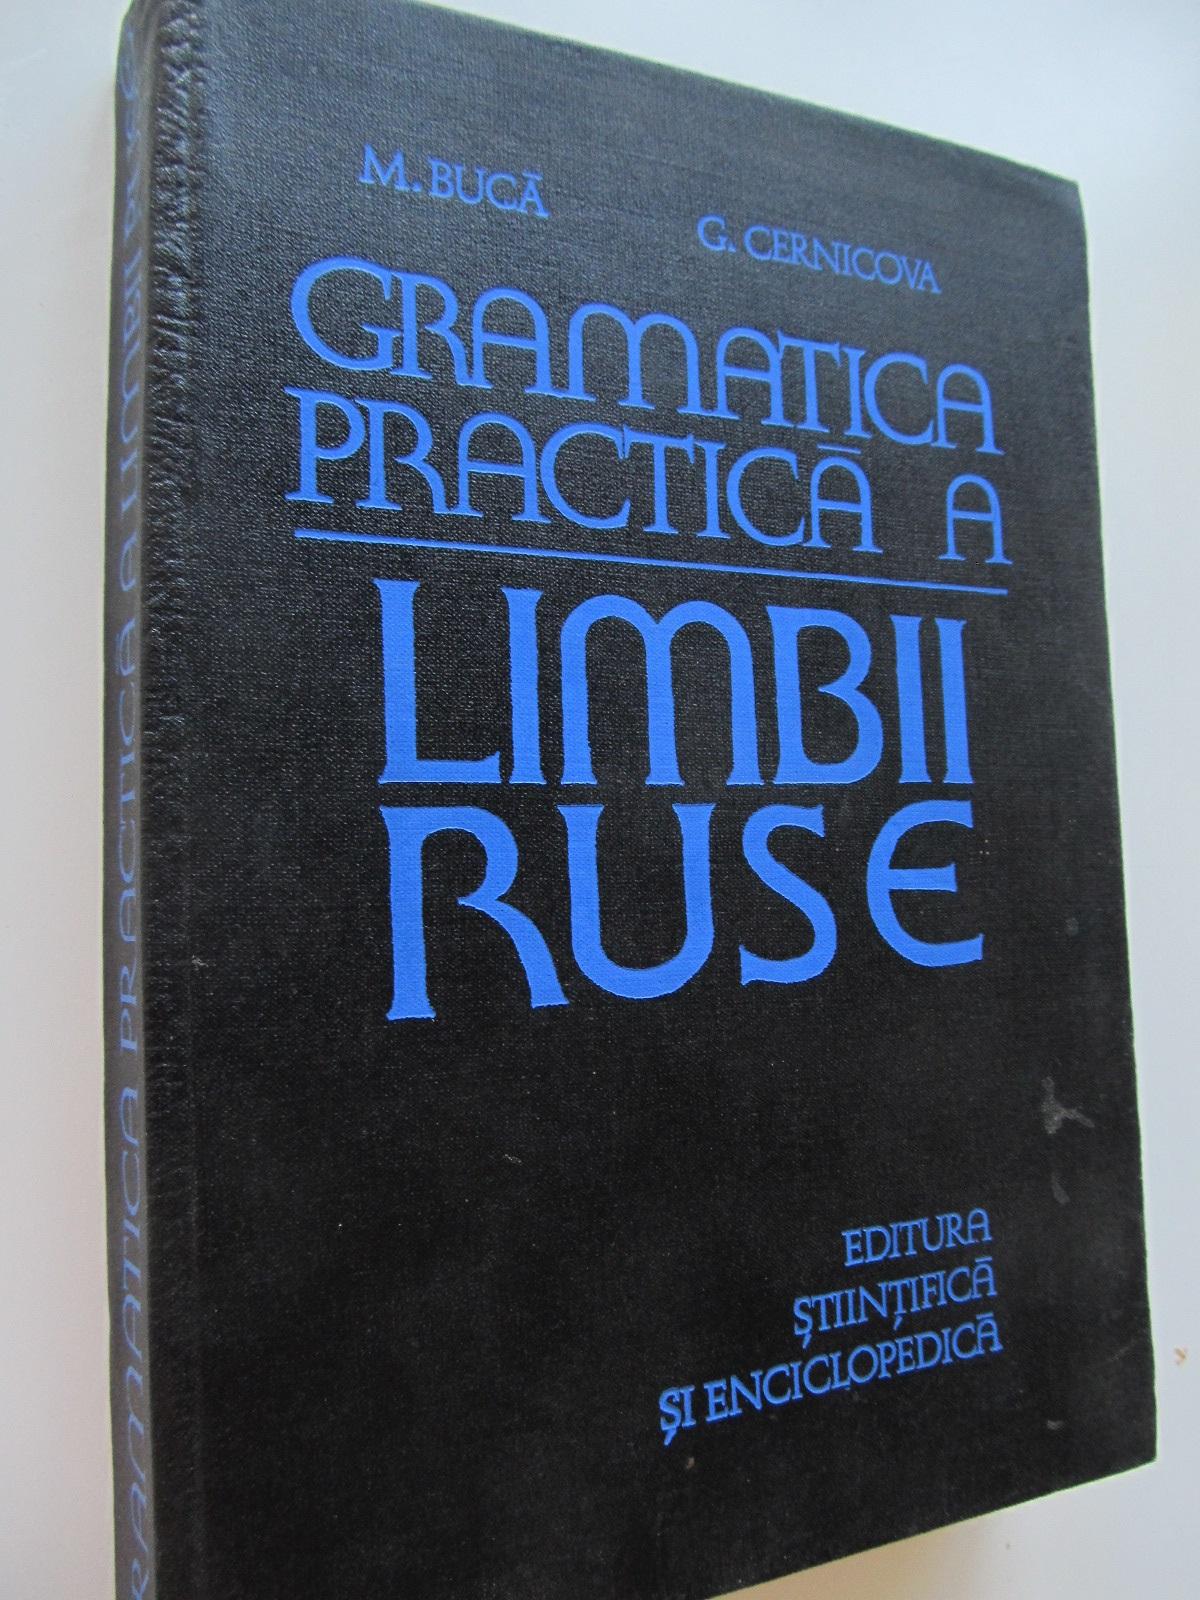 Gramatica practica a limbii Ruse - M. Buca , G. Cernicova | Detalii carte